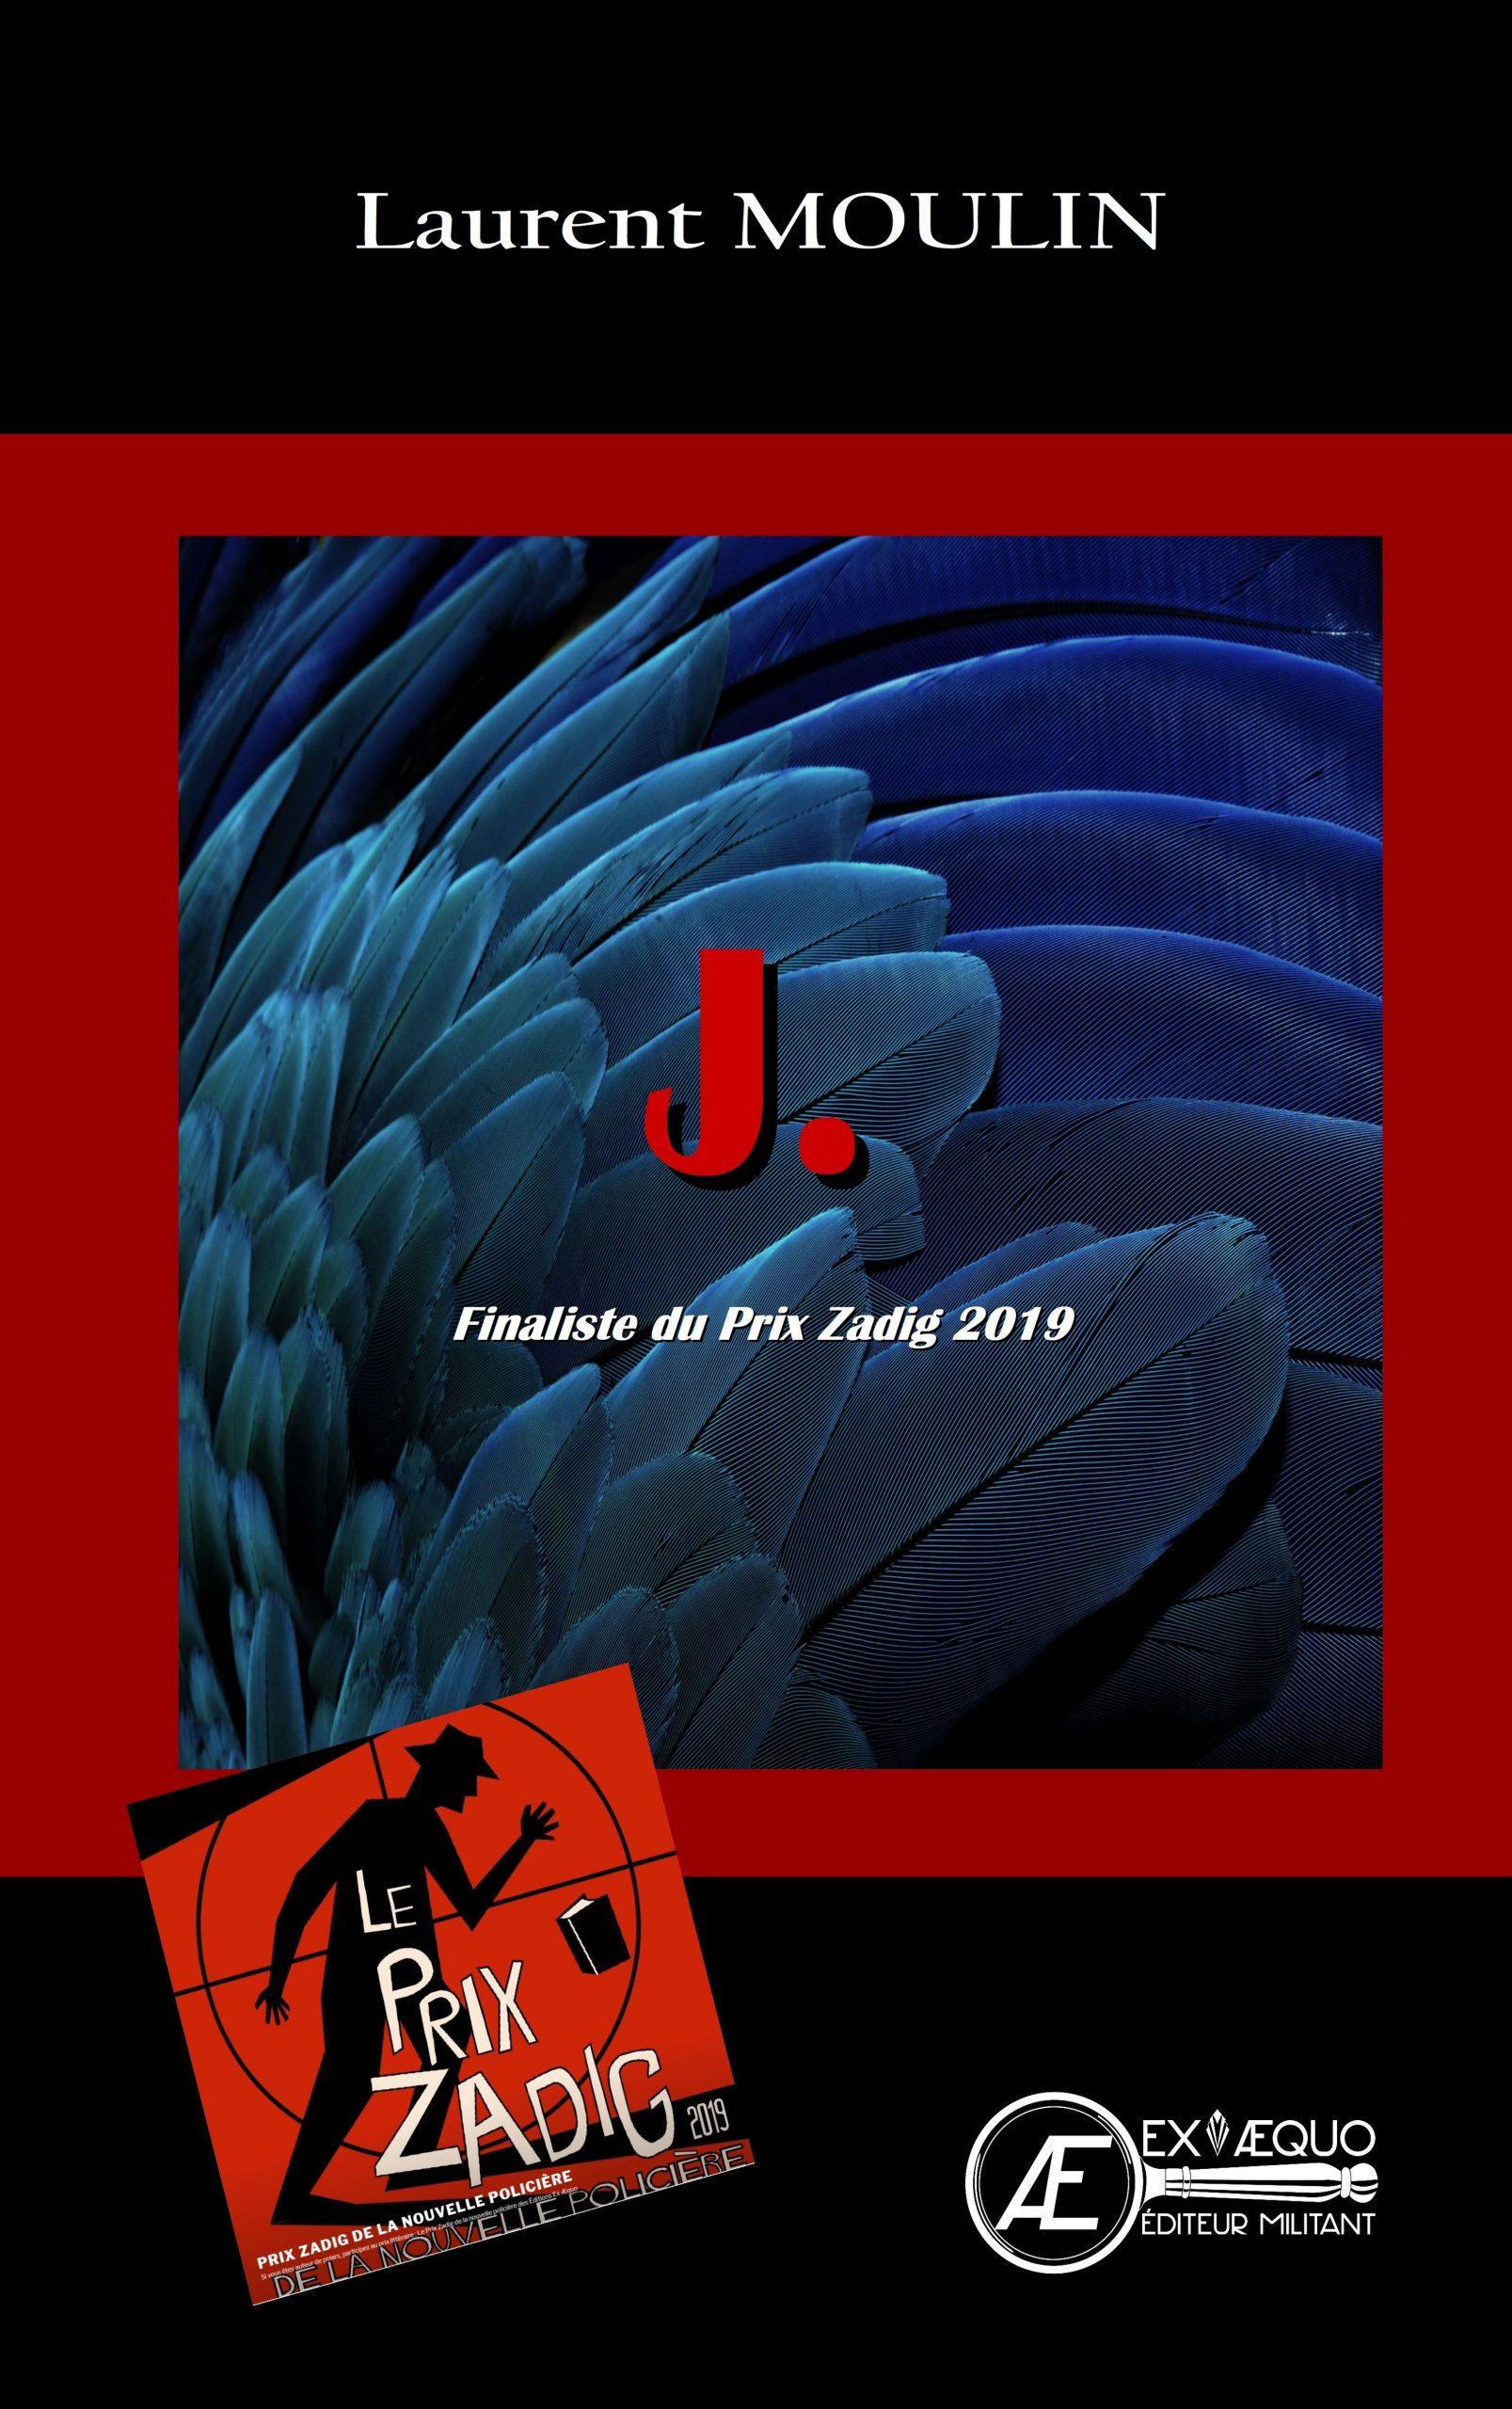 J - Laurent Moulin - Finaliste Prix Zadig 2019